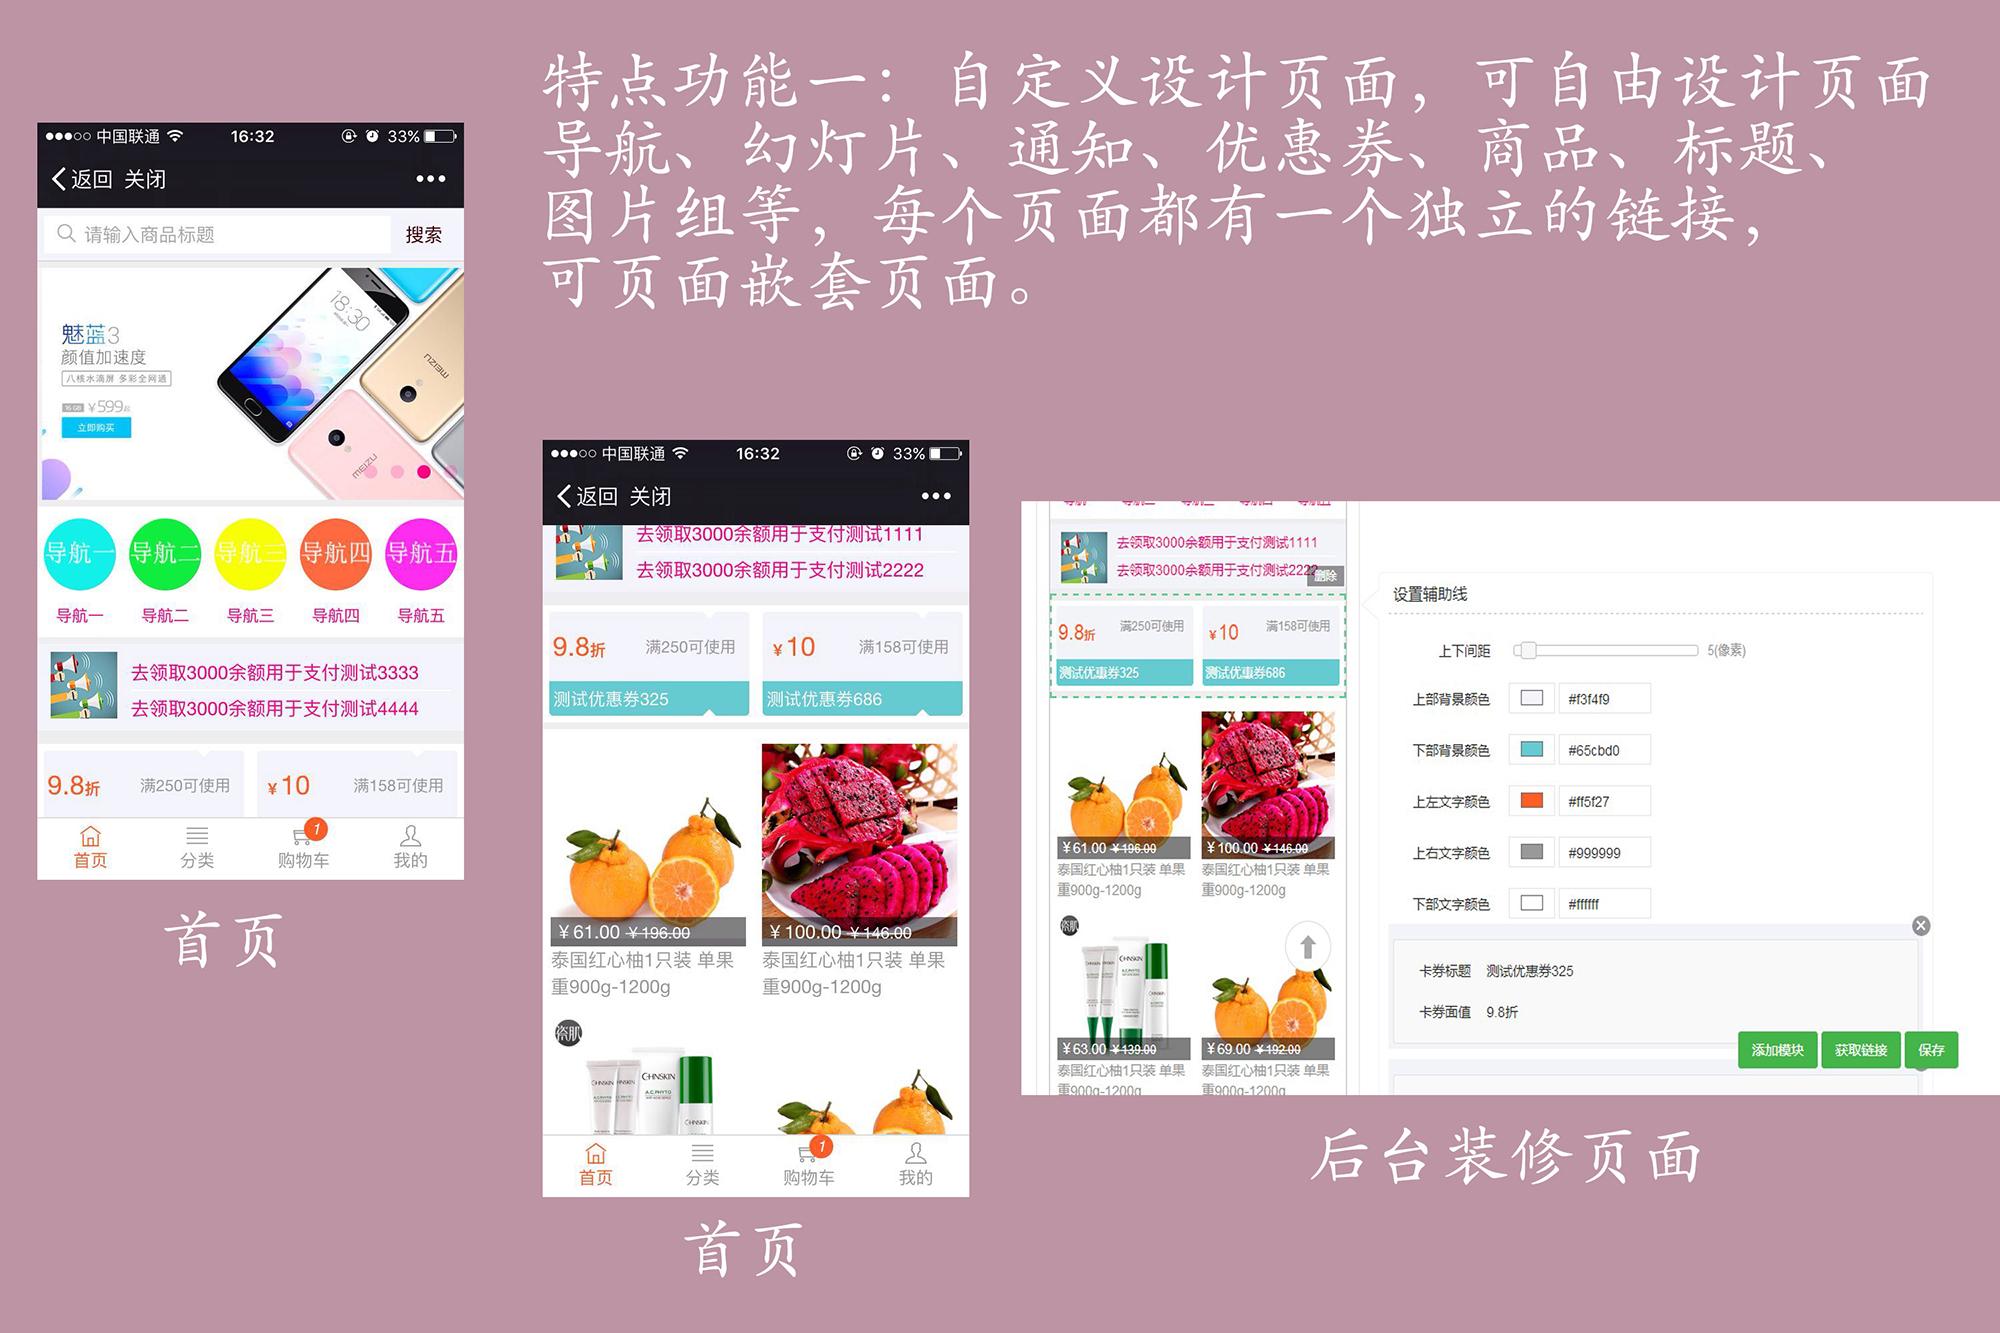 wq模块众惠团购商城V1.6.3开源版-渔枫网络资源网